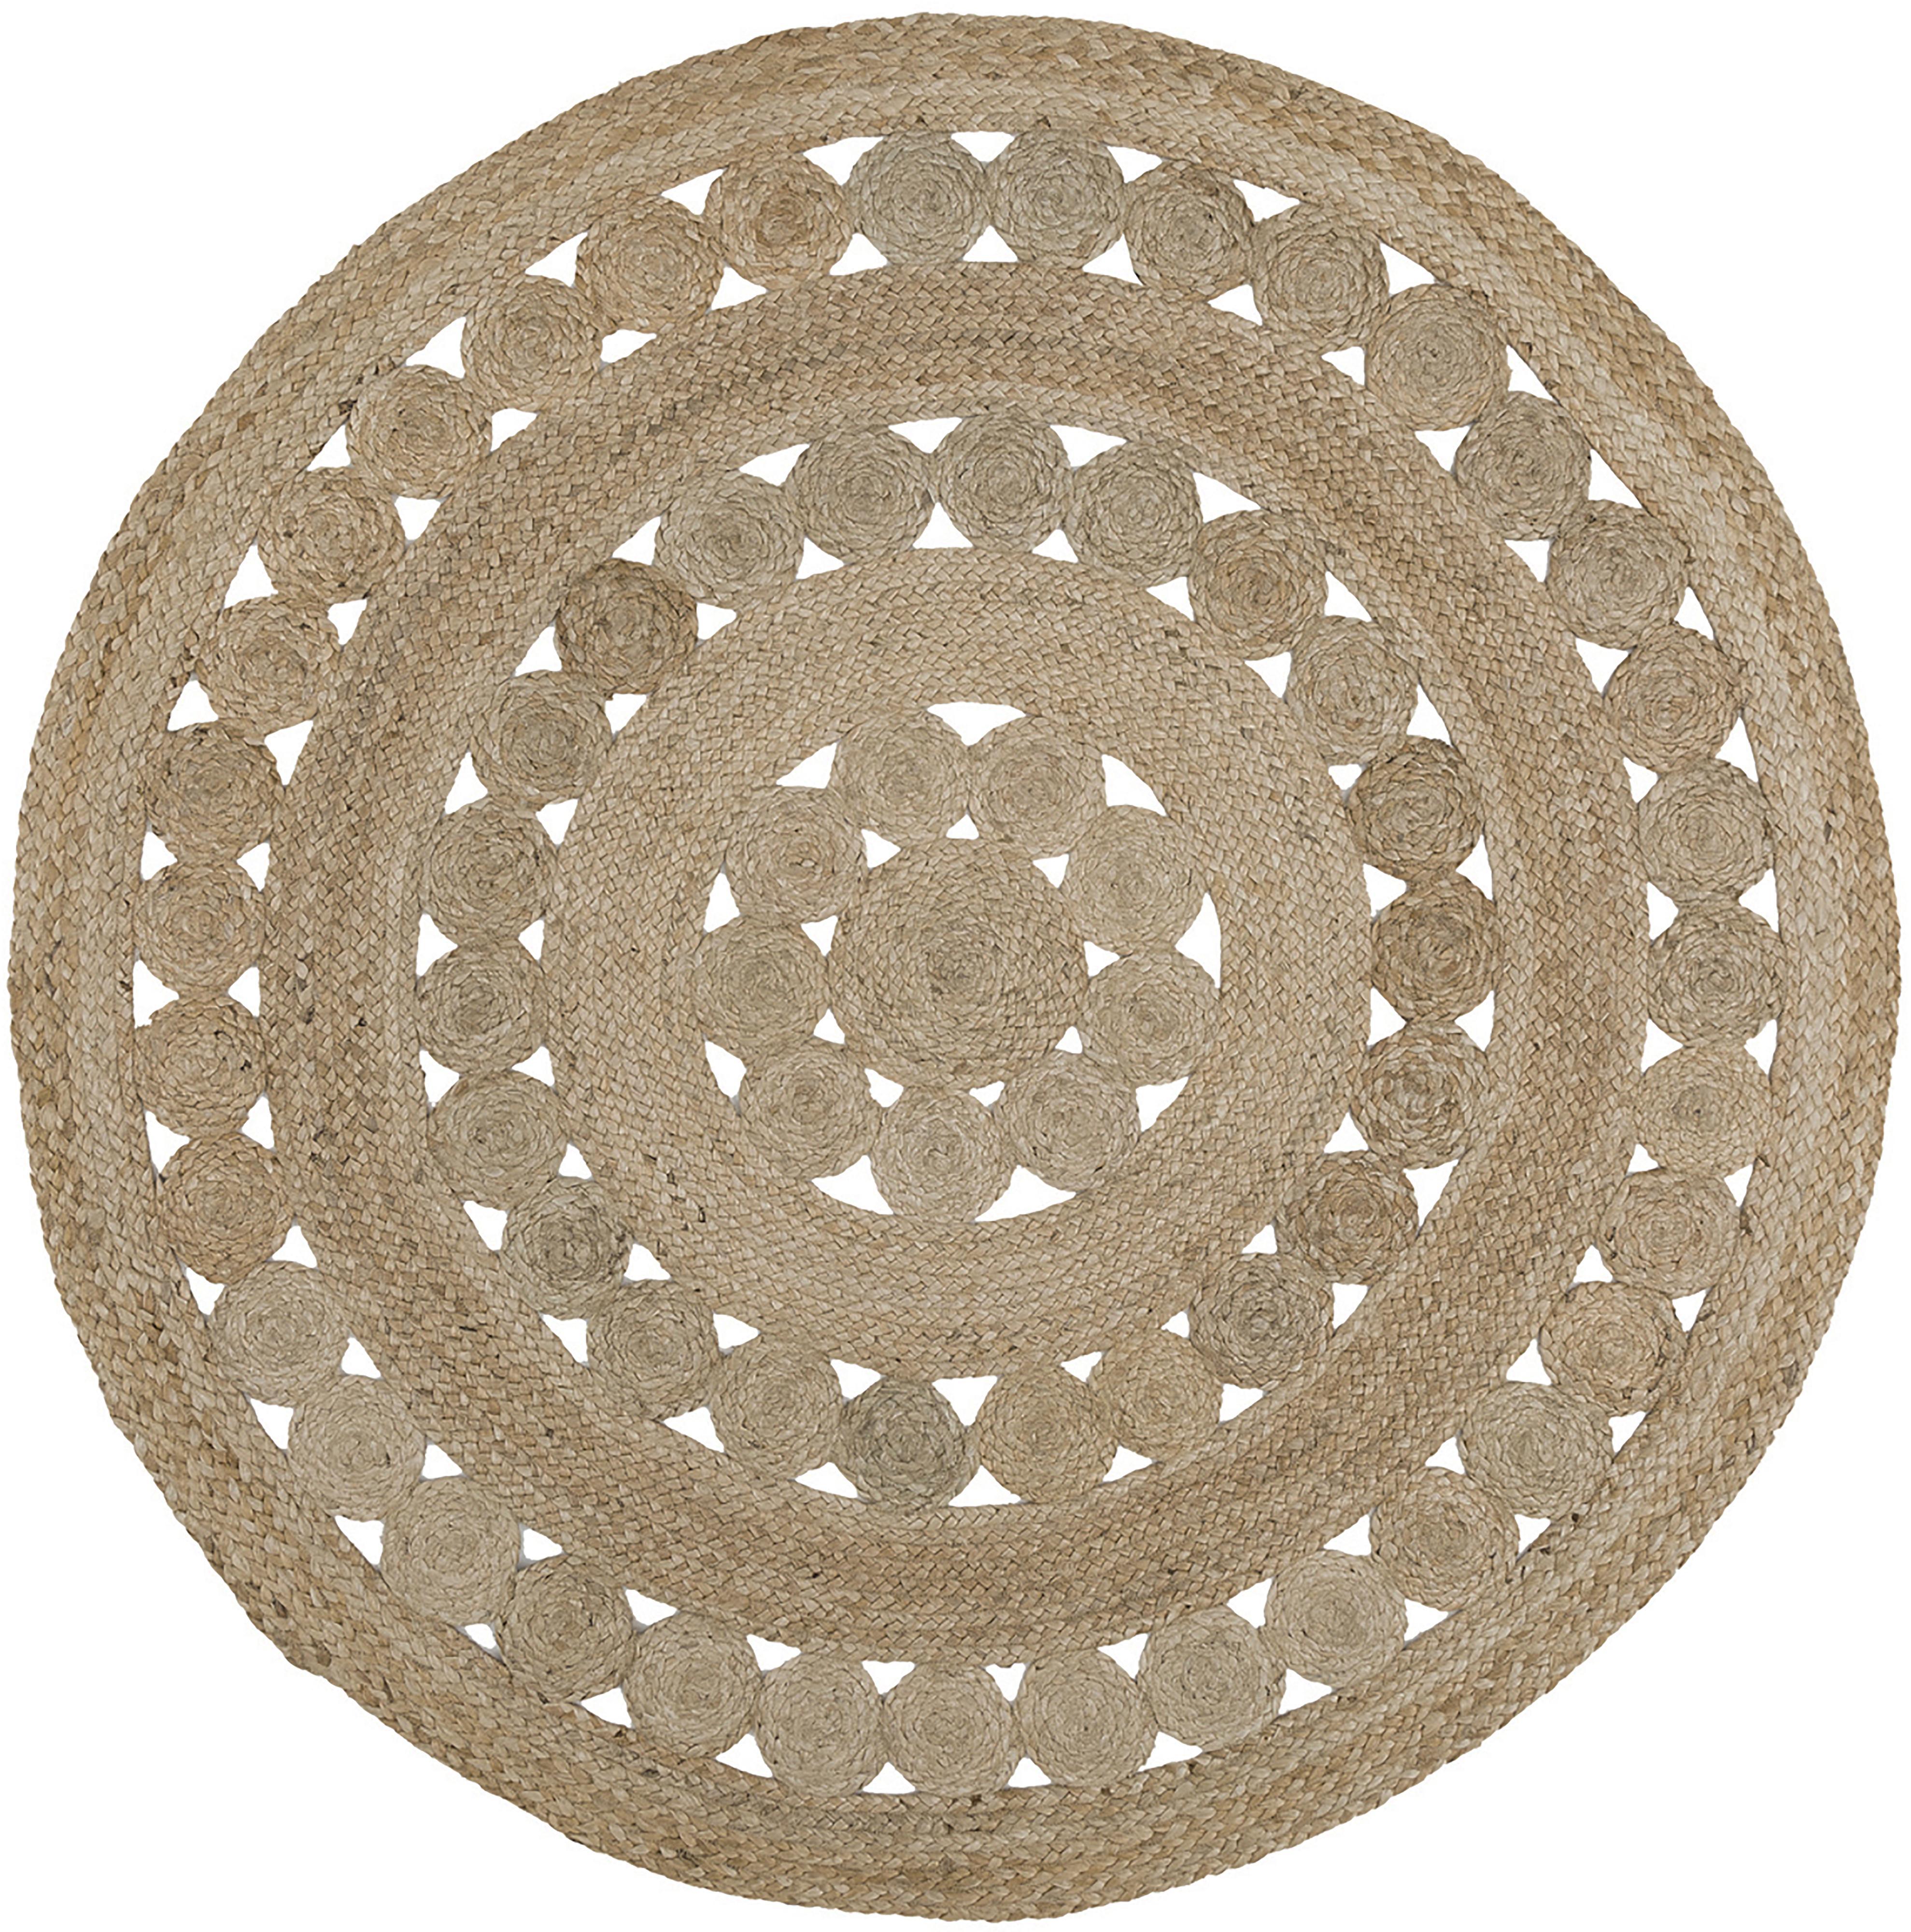 Handgemaakte jute vloerkleed Shyam, Jutekleurig, Ø 150 cm